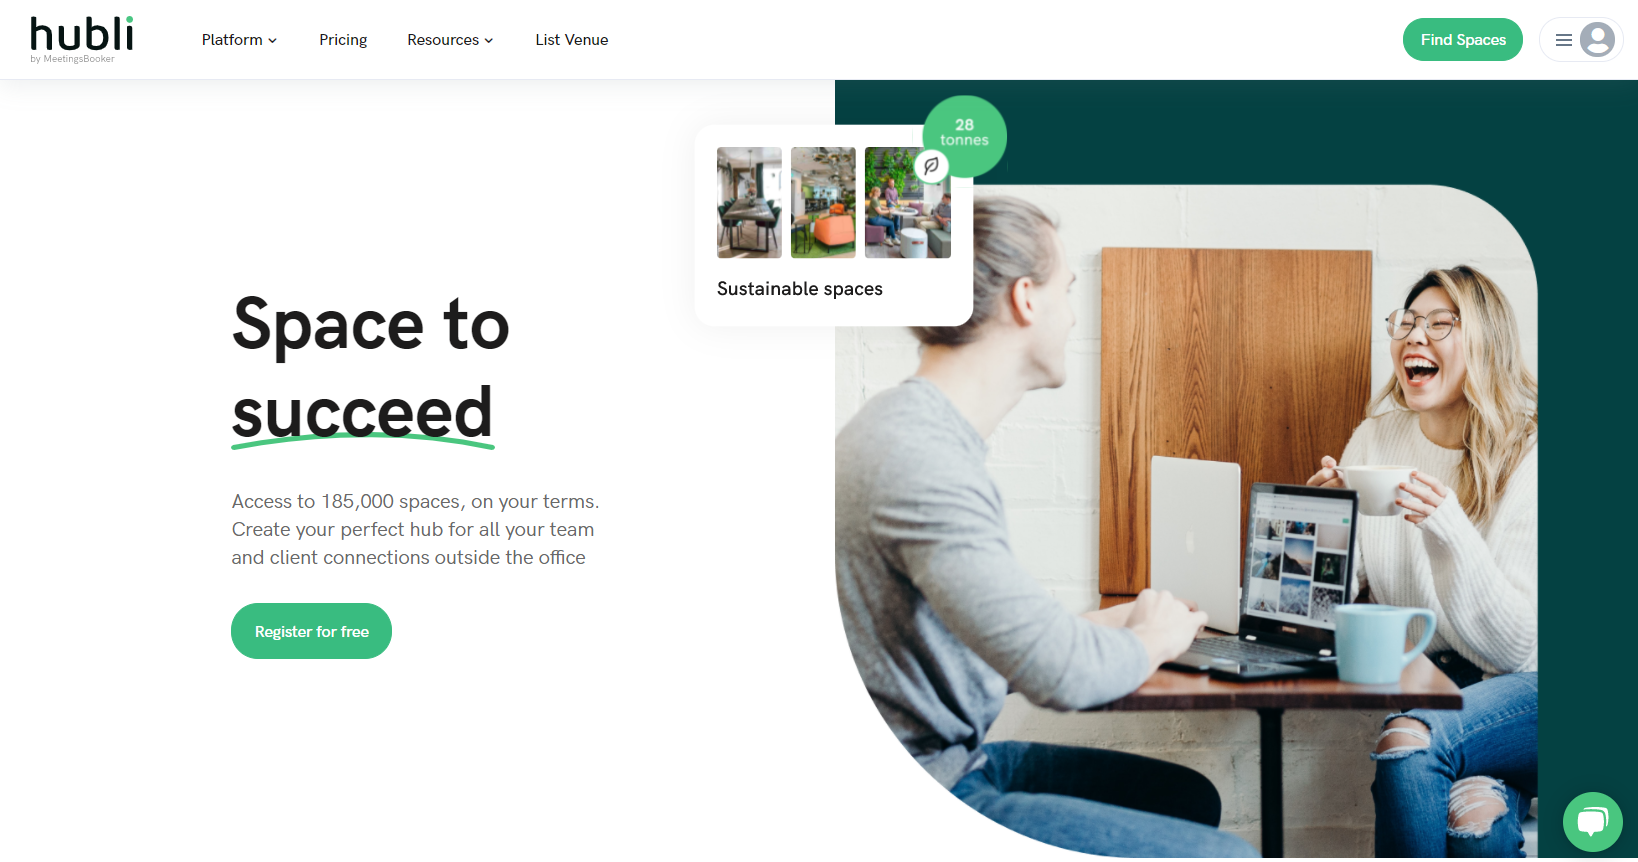 Meetingsbooker launches new brand Hubli